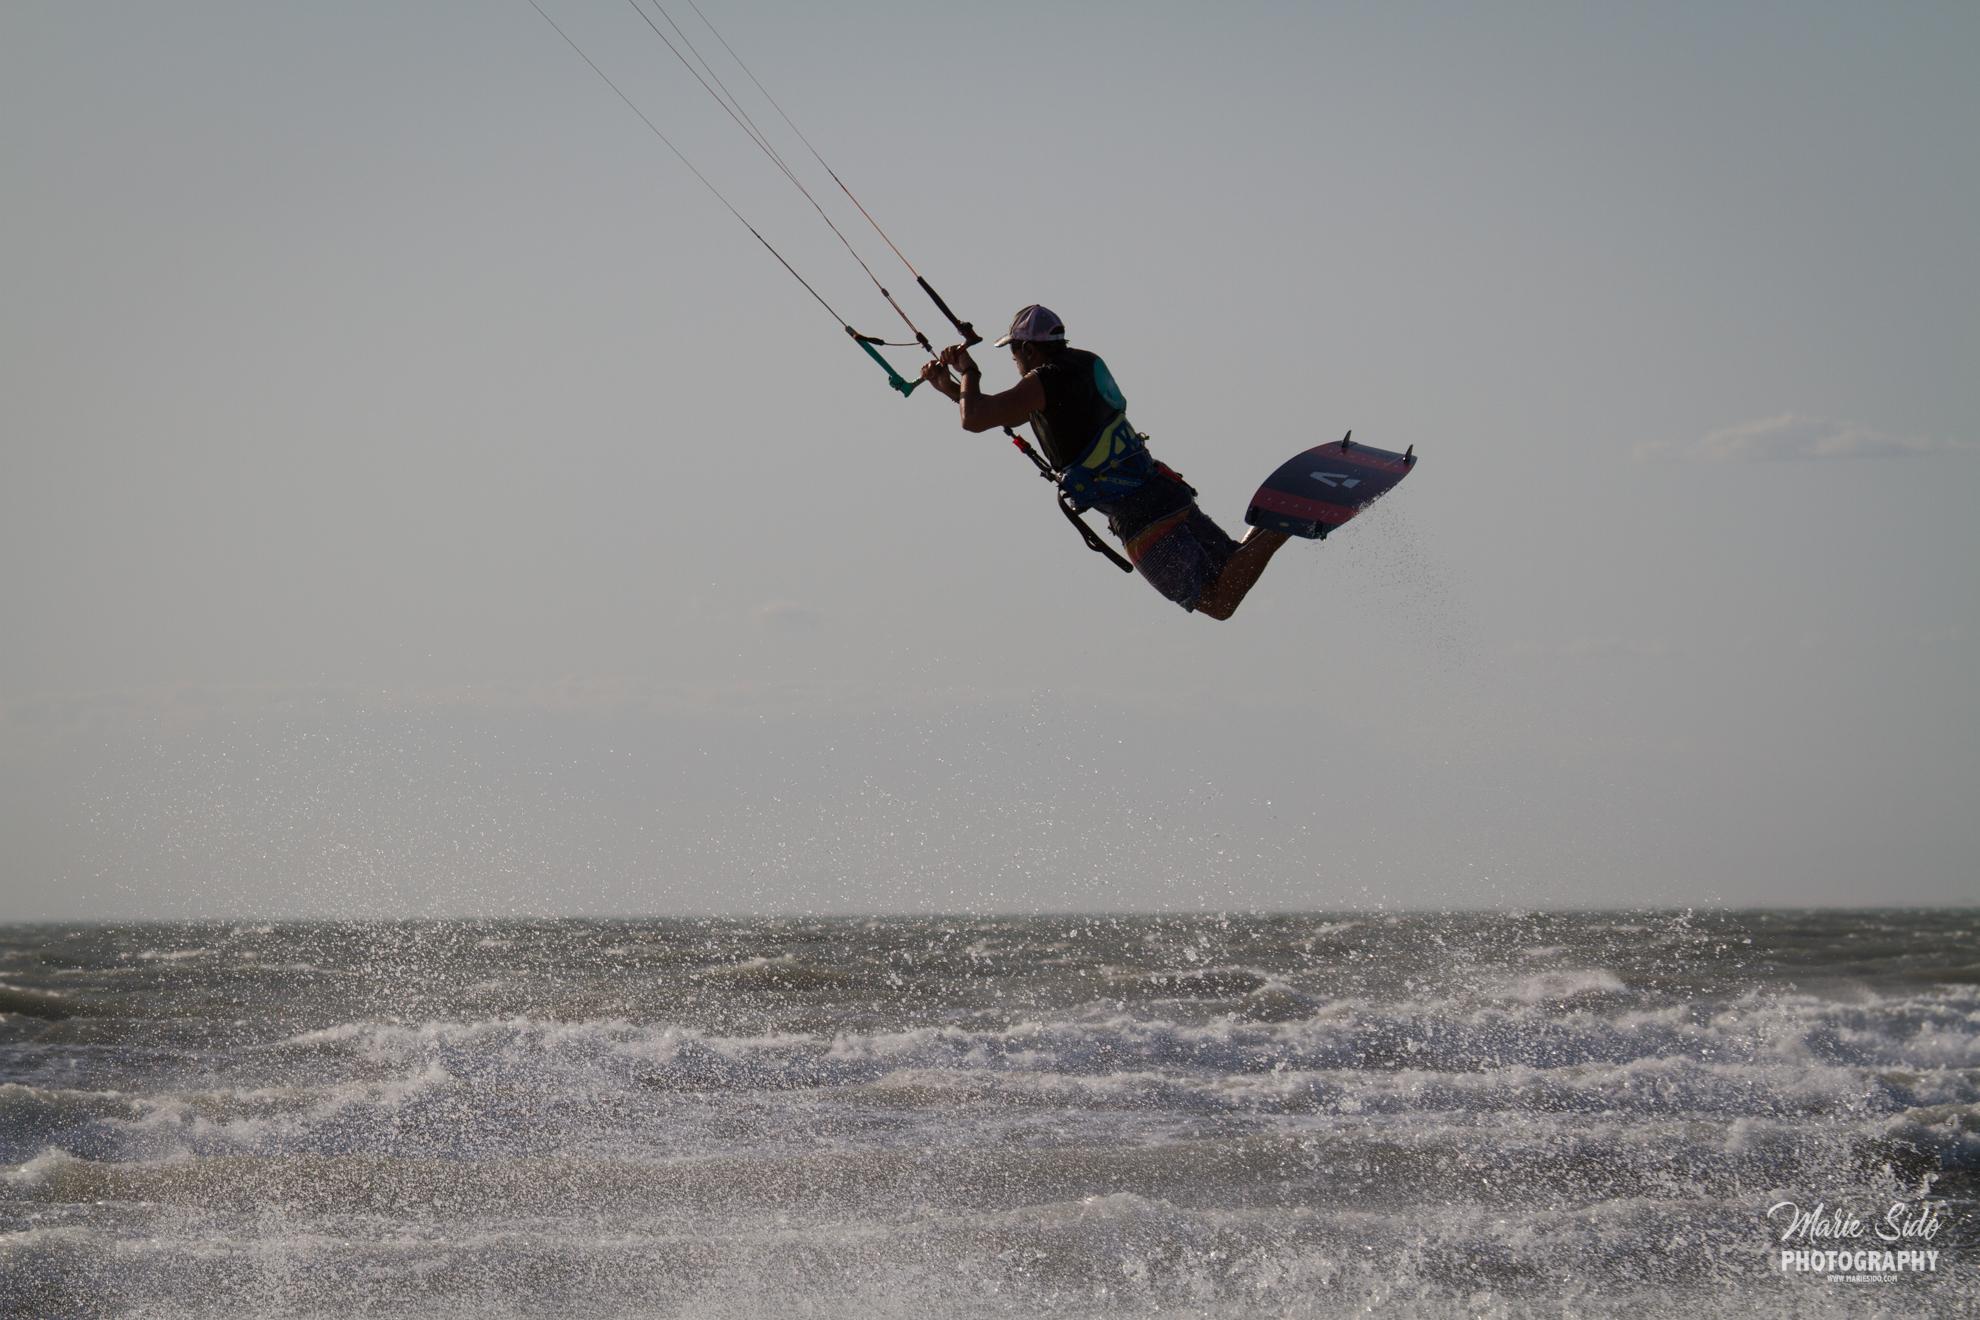 Beauduc Kitesurfing, railey hooké jump en kitesurf, Mari Sido photography